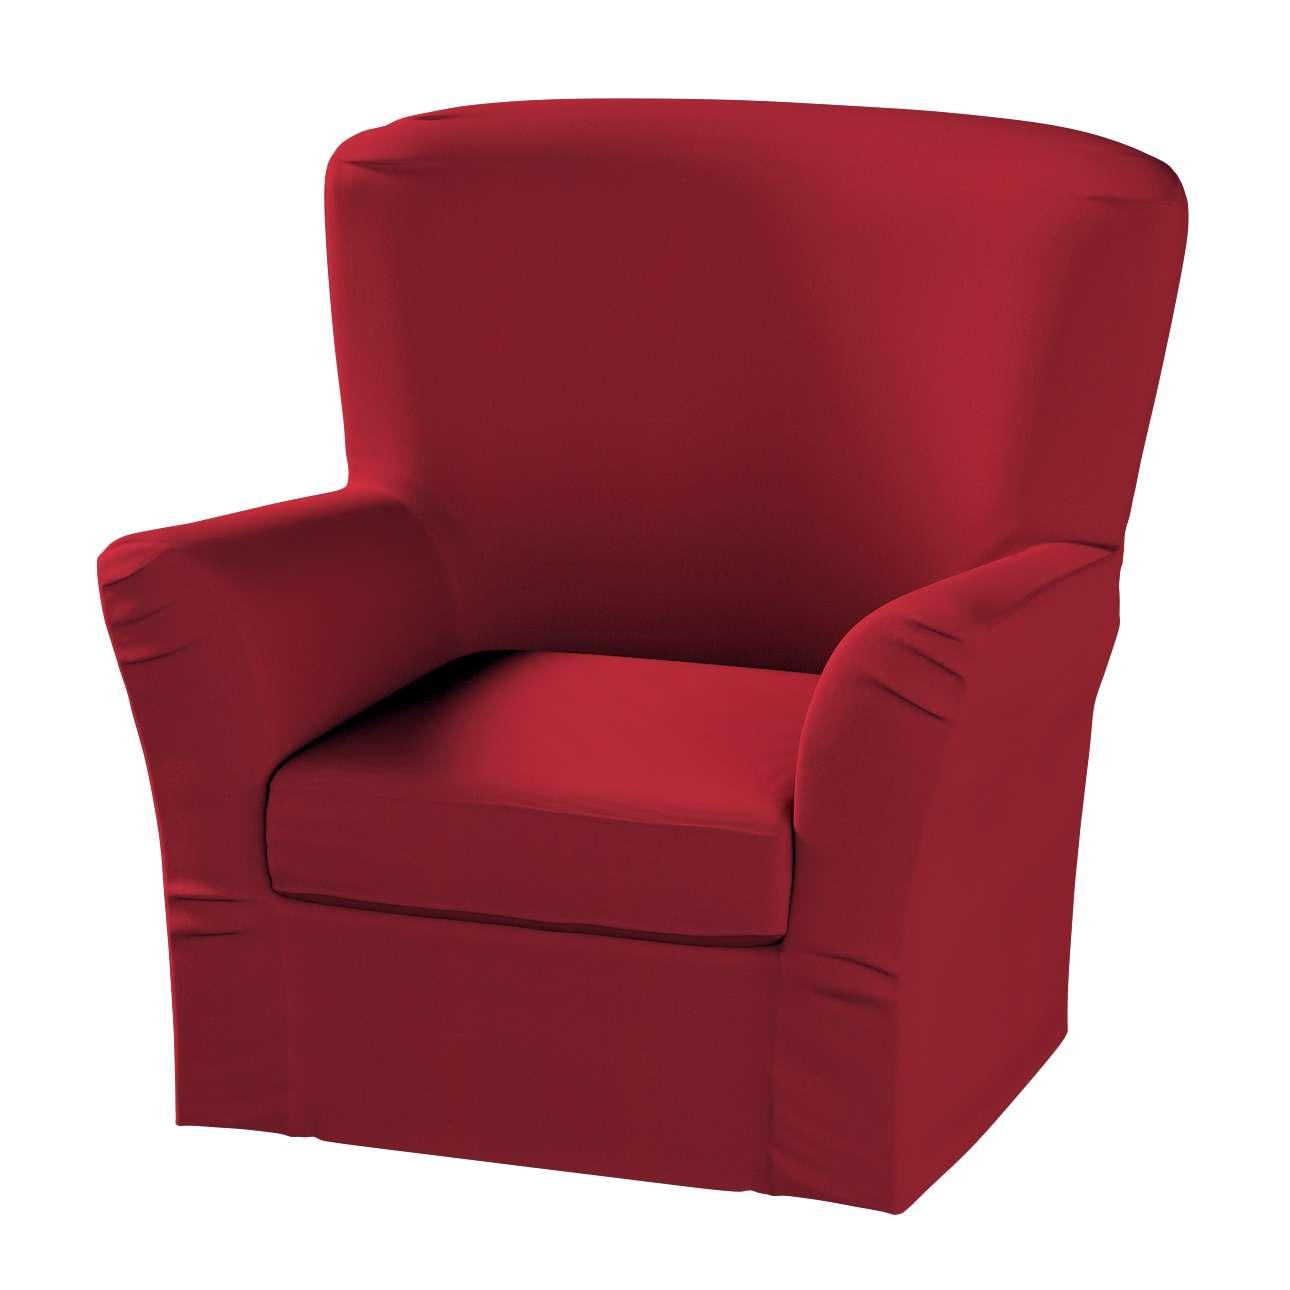 Tomelilla armchair  Tomelilla armchair in collection Chenille, fabric: 702-24